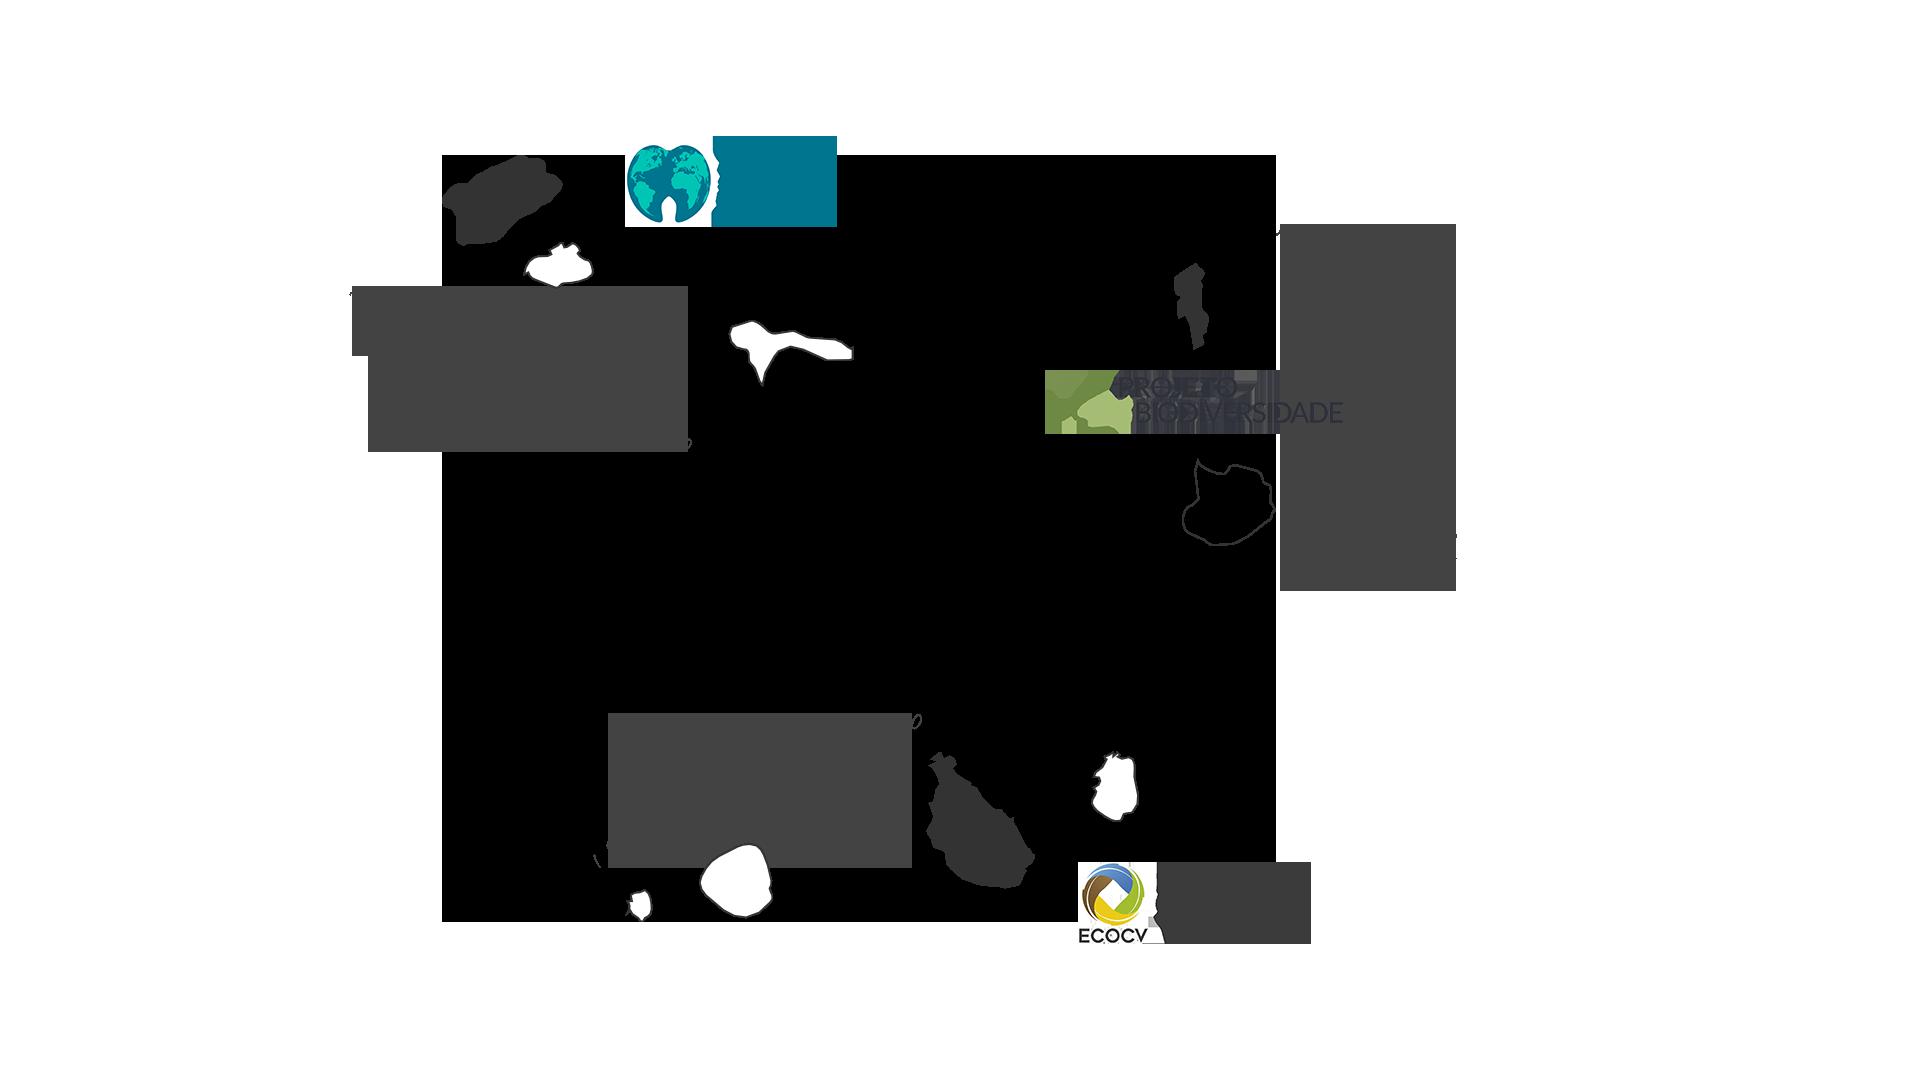 viajes responsables mapa proyectos cabo verde